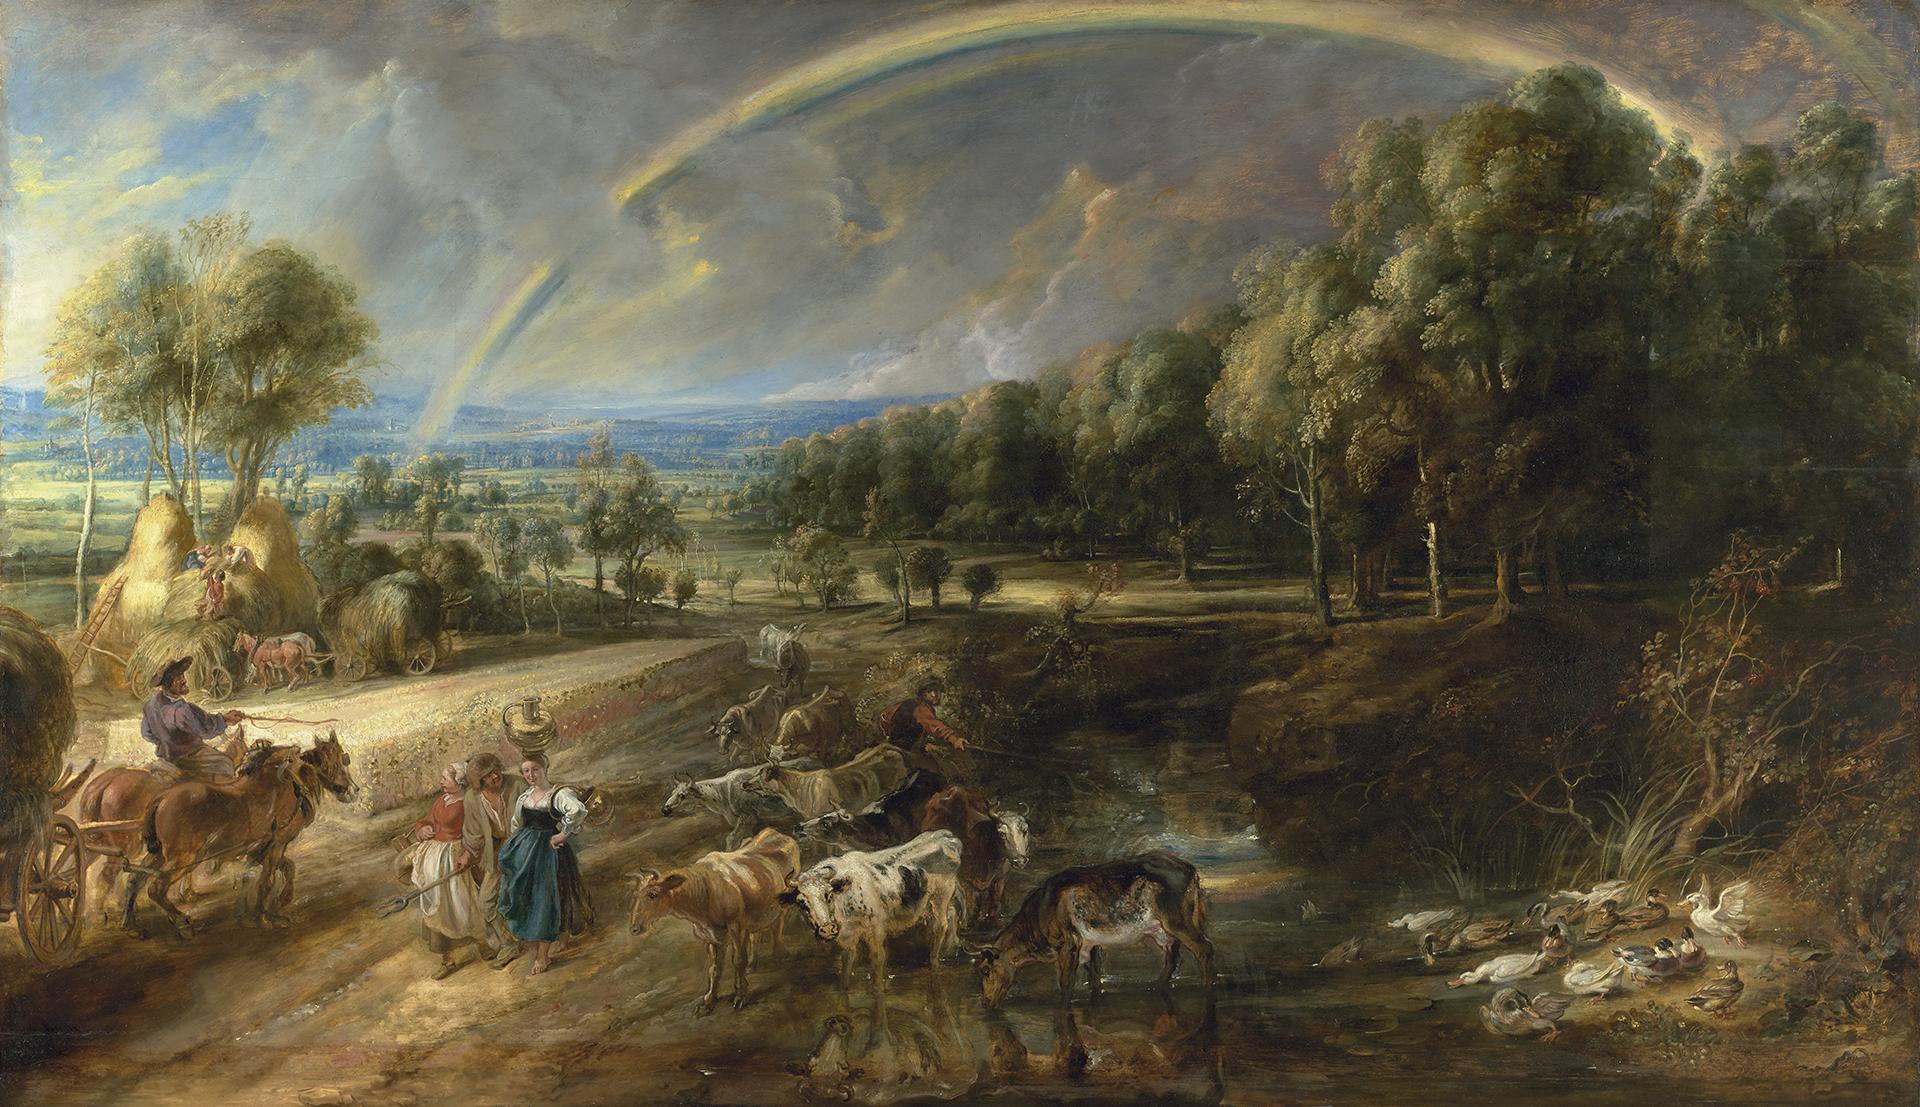 1. Peter Paul Rubens (1577-1640), The Rainbow Landscape, ca. 1636The Wallace Collection, London © The Wallace Collection, London. Photo: Colin White